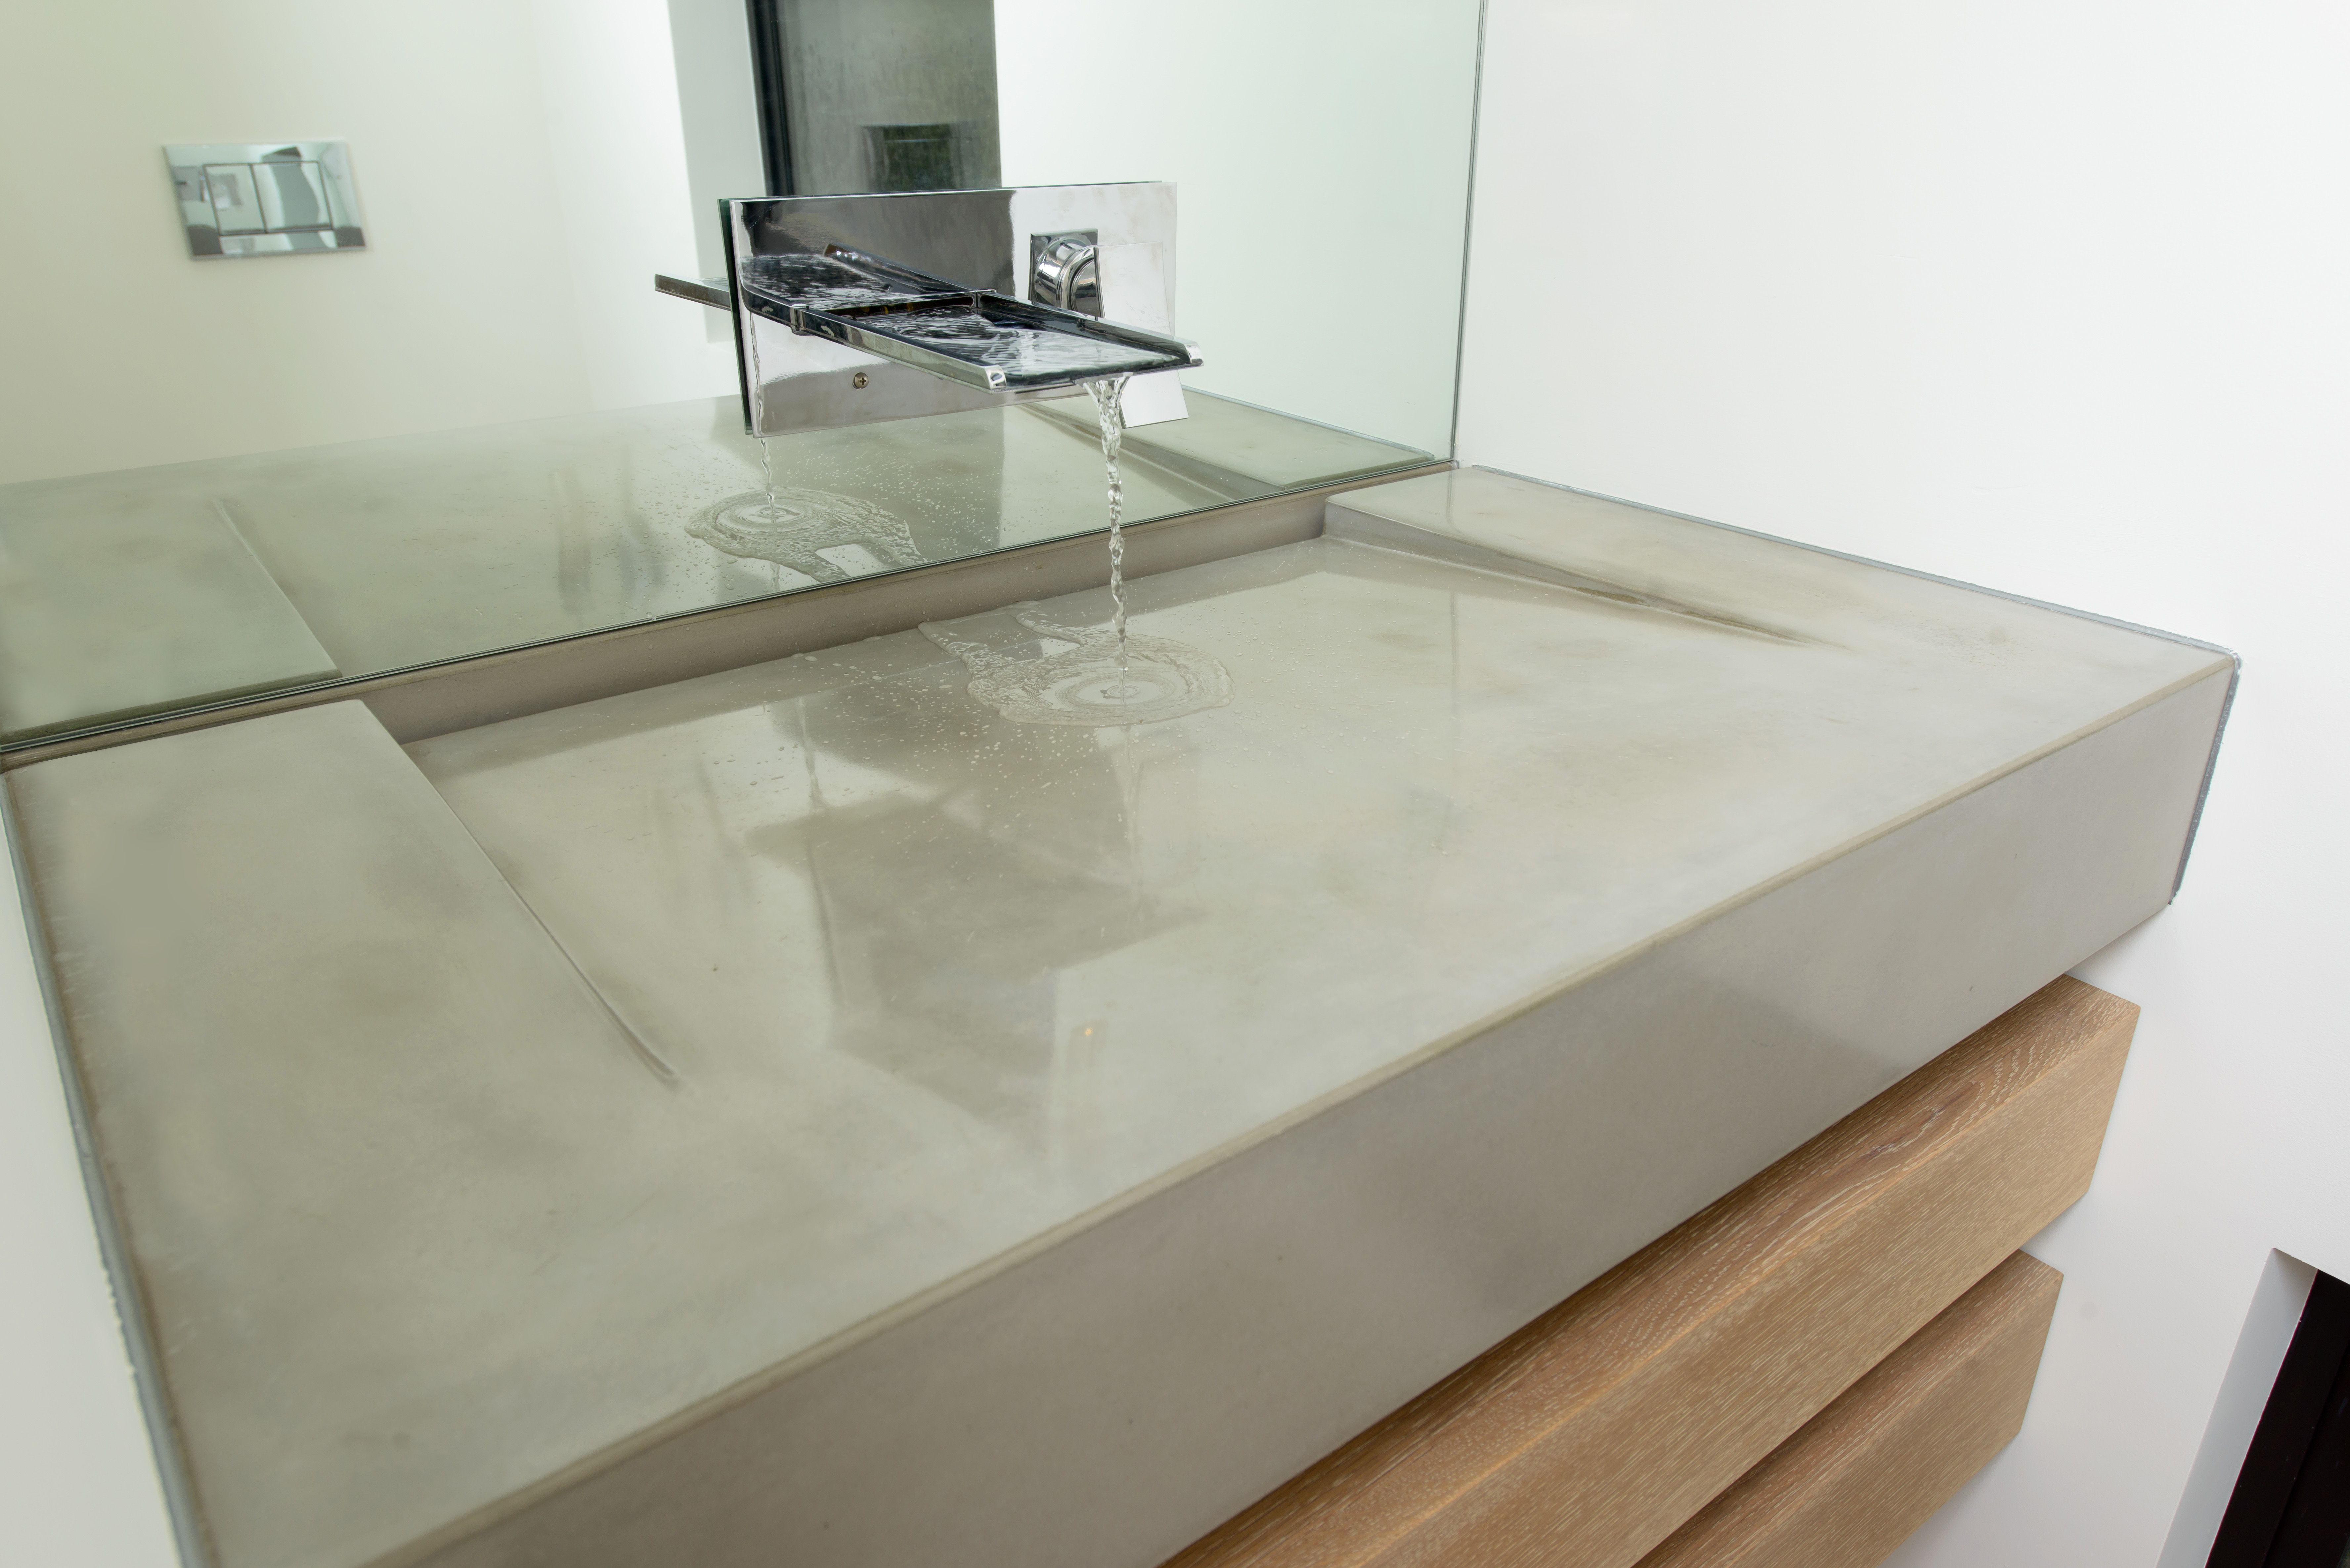 Minimal Slope Concrete Ramp Sink With Negative Edge Slot Drain